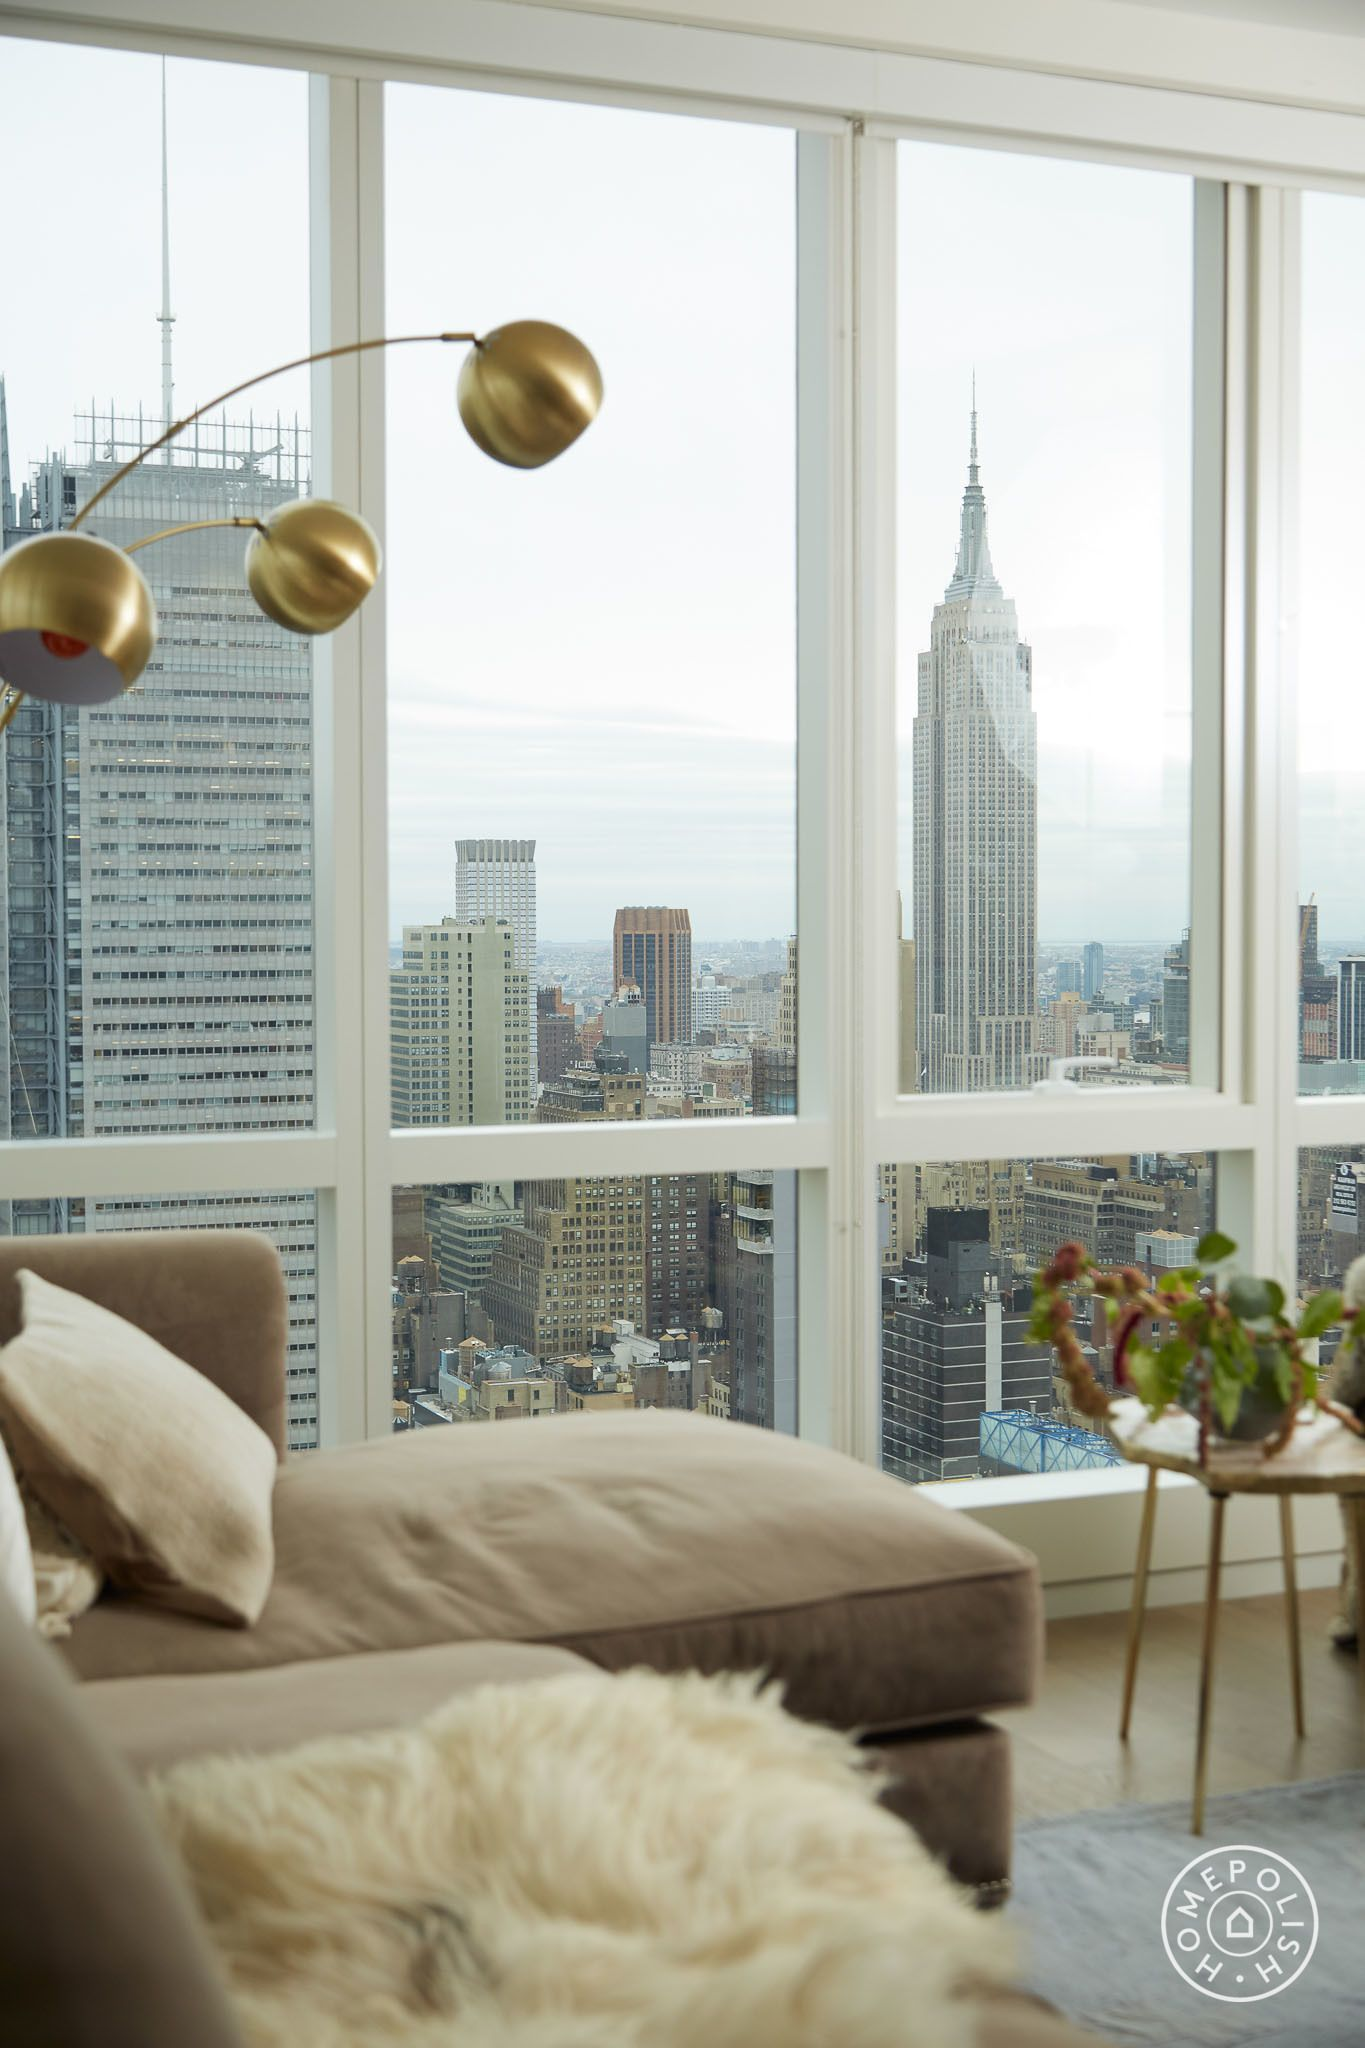 Hamilton actress lexi lawsons living room by homepolish designer amy row